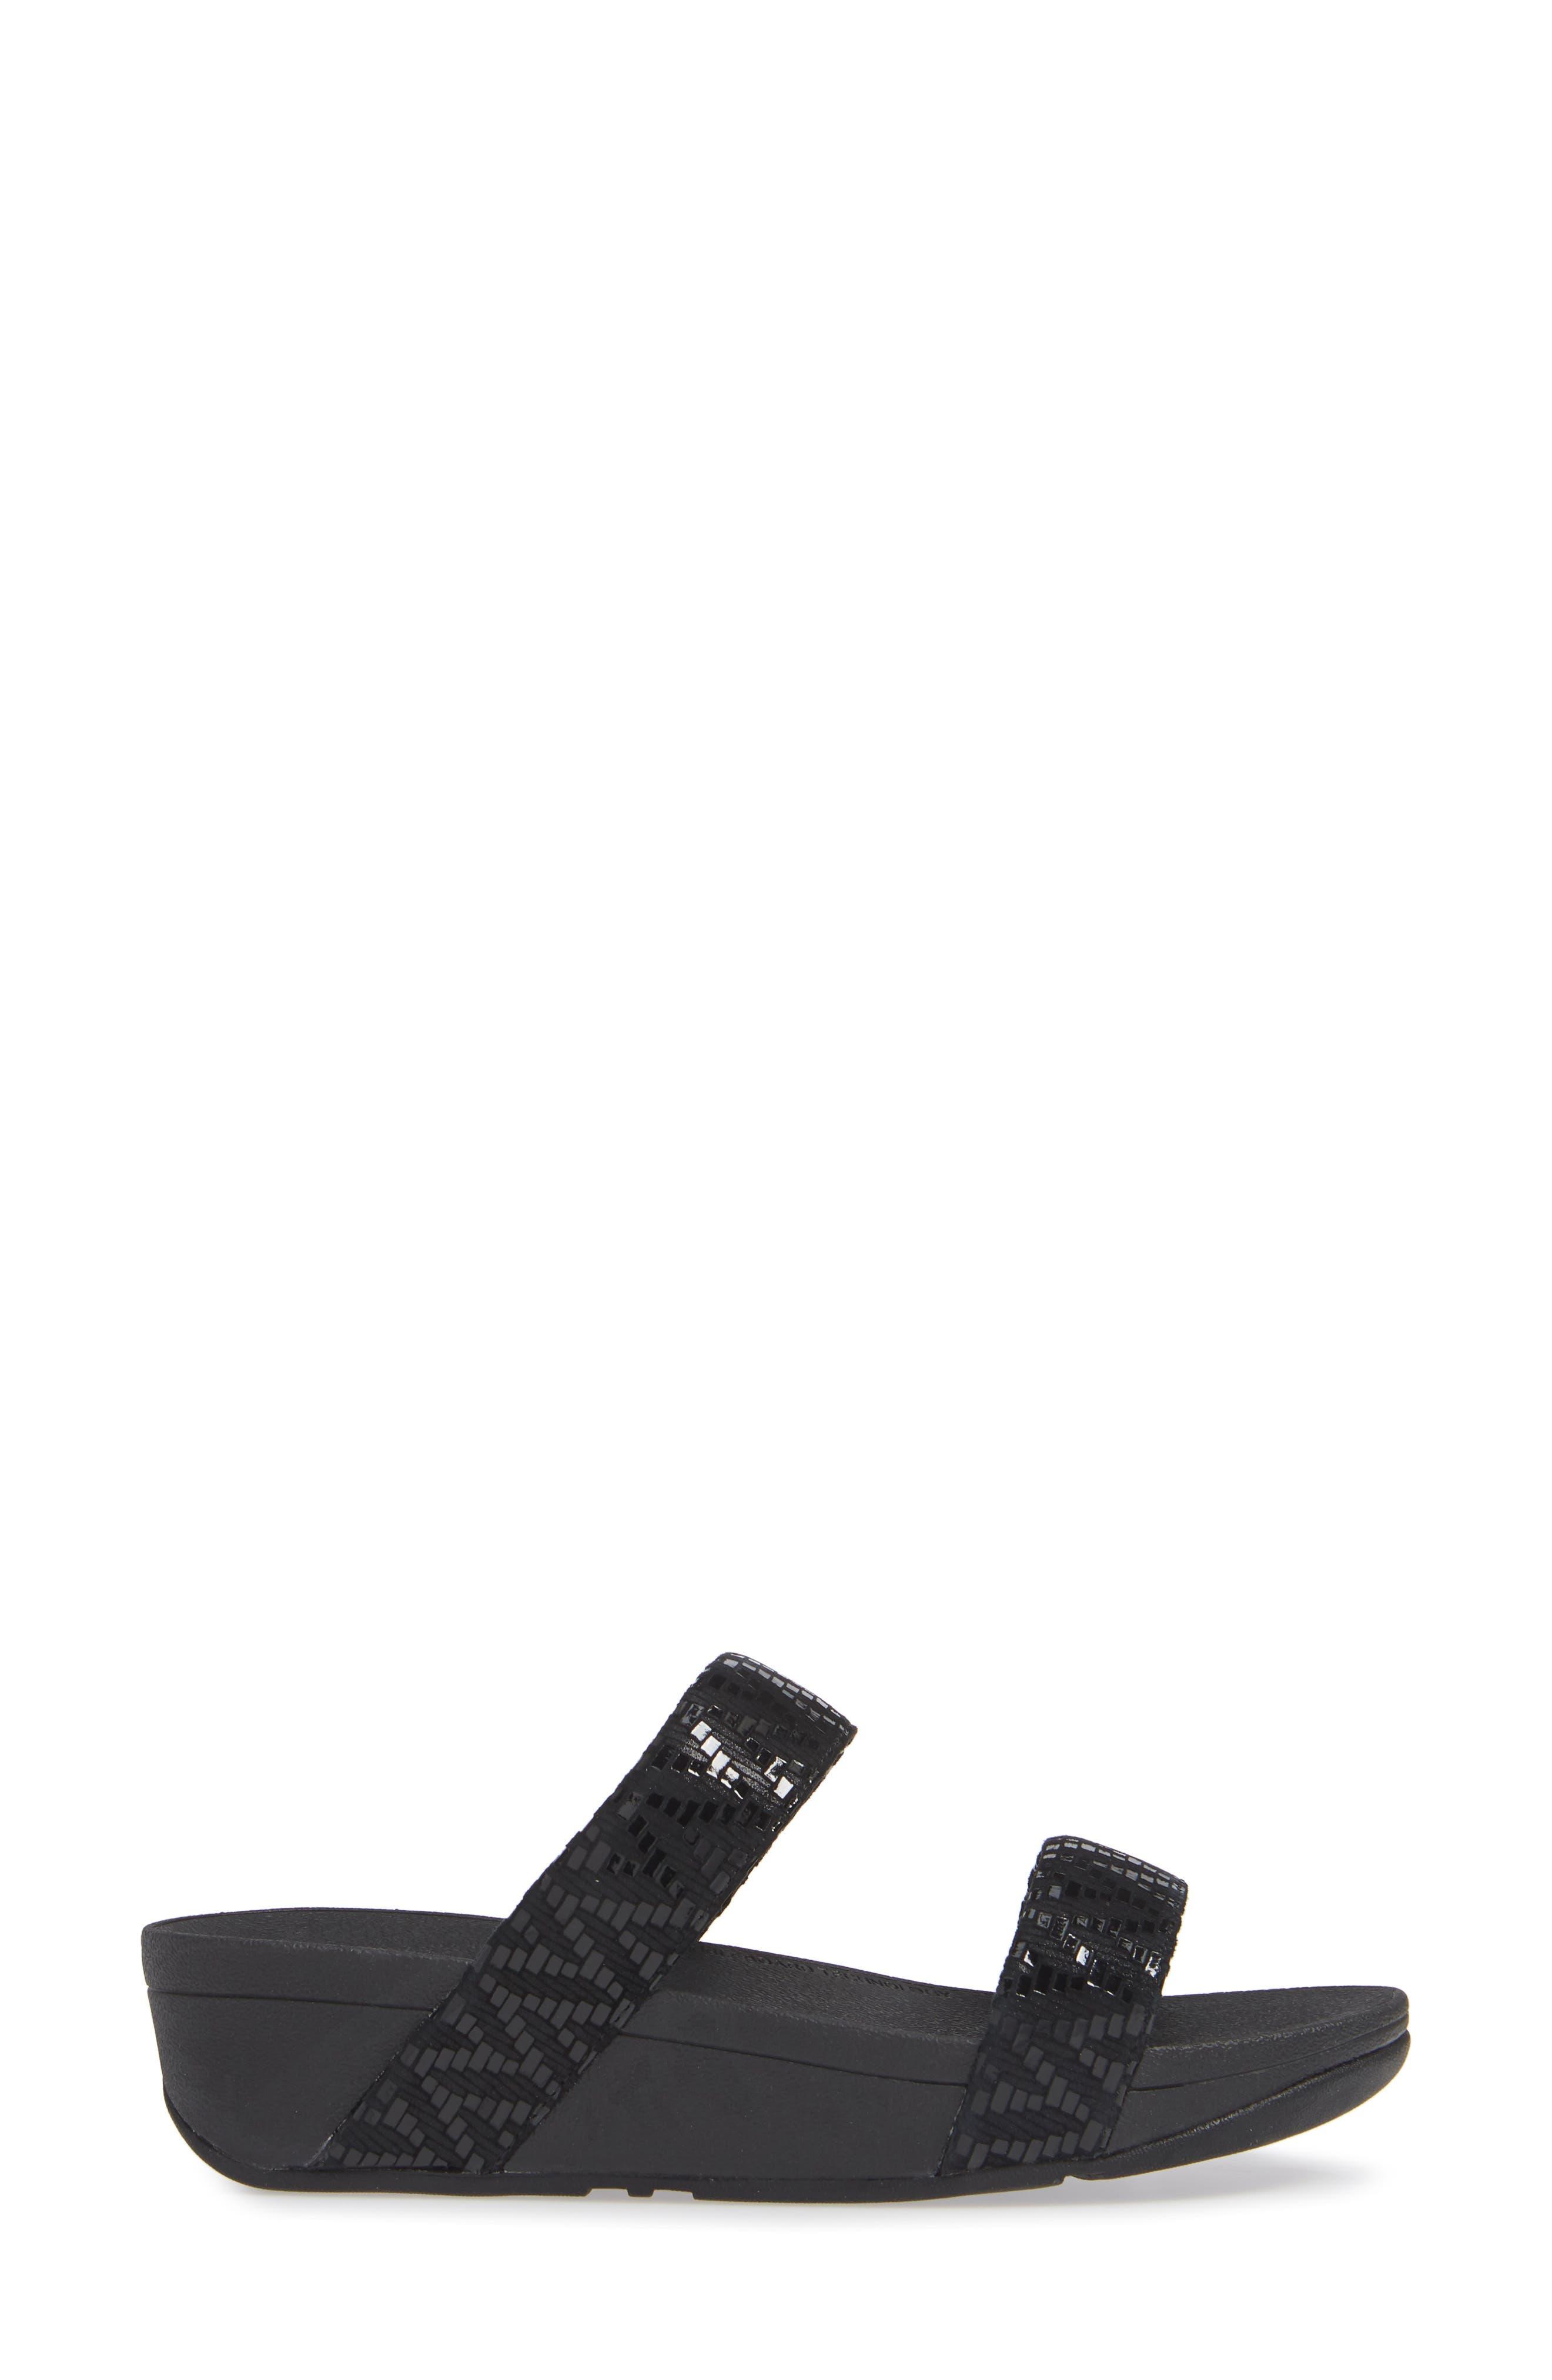 Lottie Chevron Wedge Slide Sandal,                             Alternate thumbnail 3, color,                             BLACK FABRIC